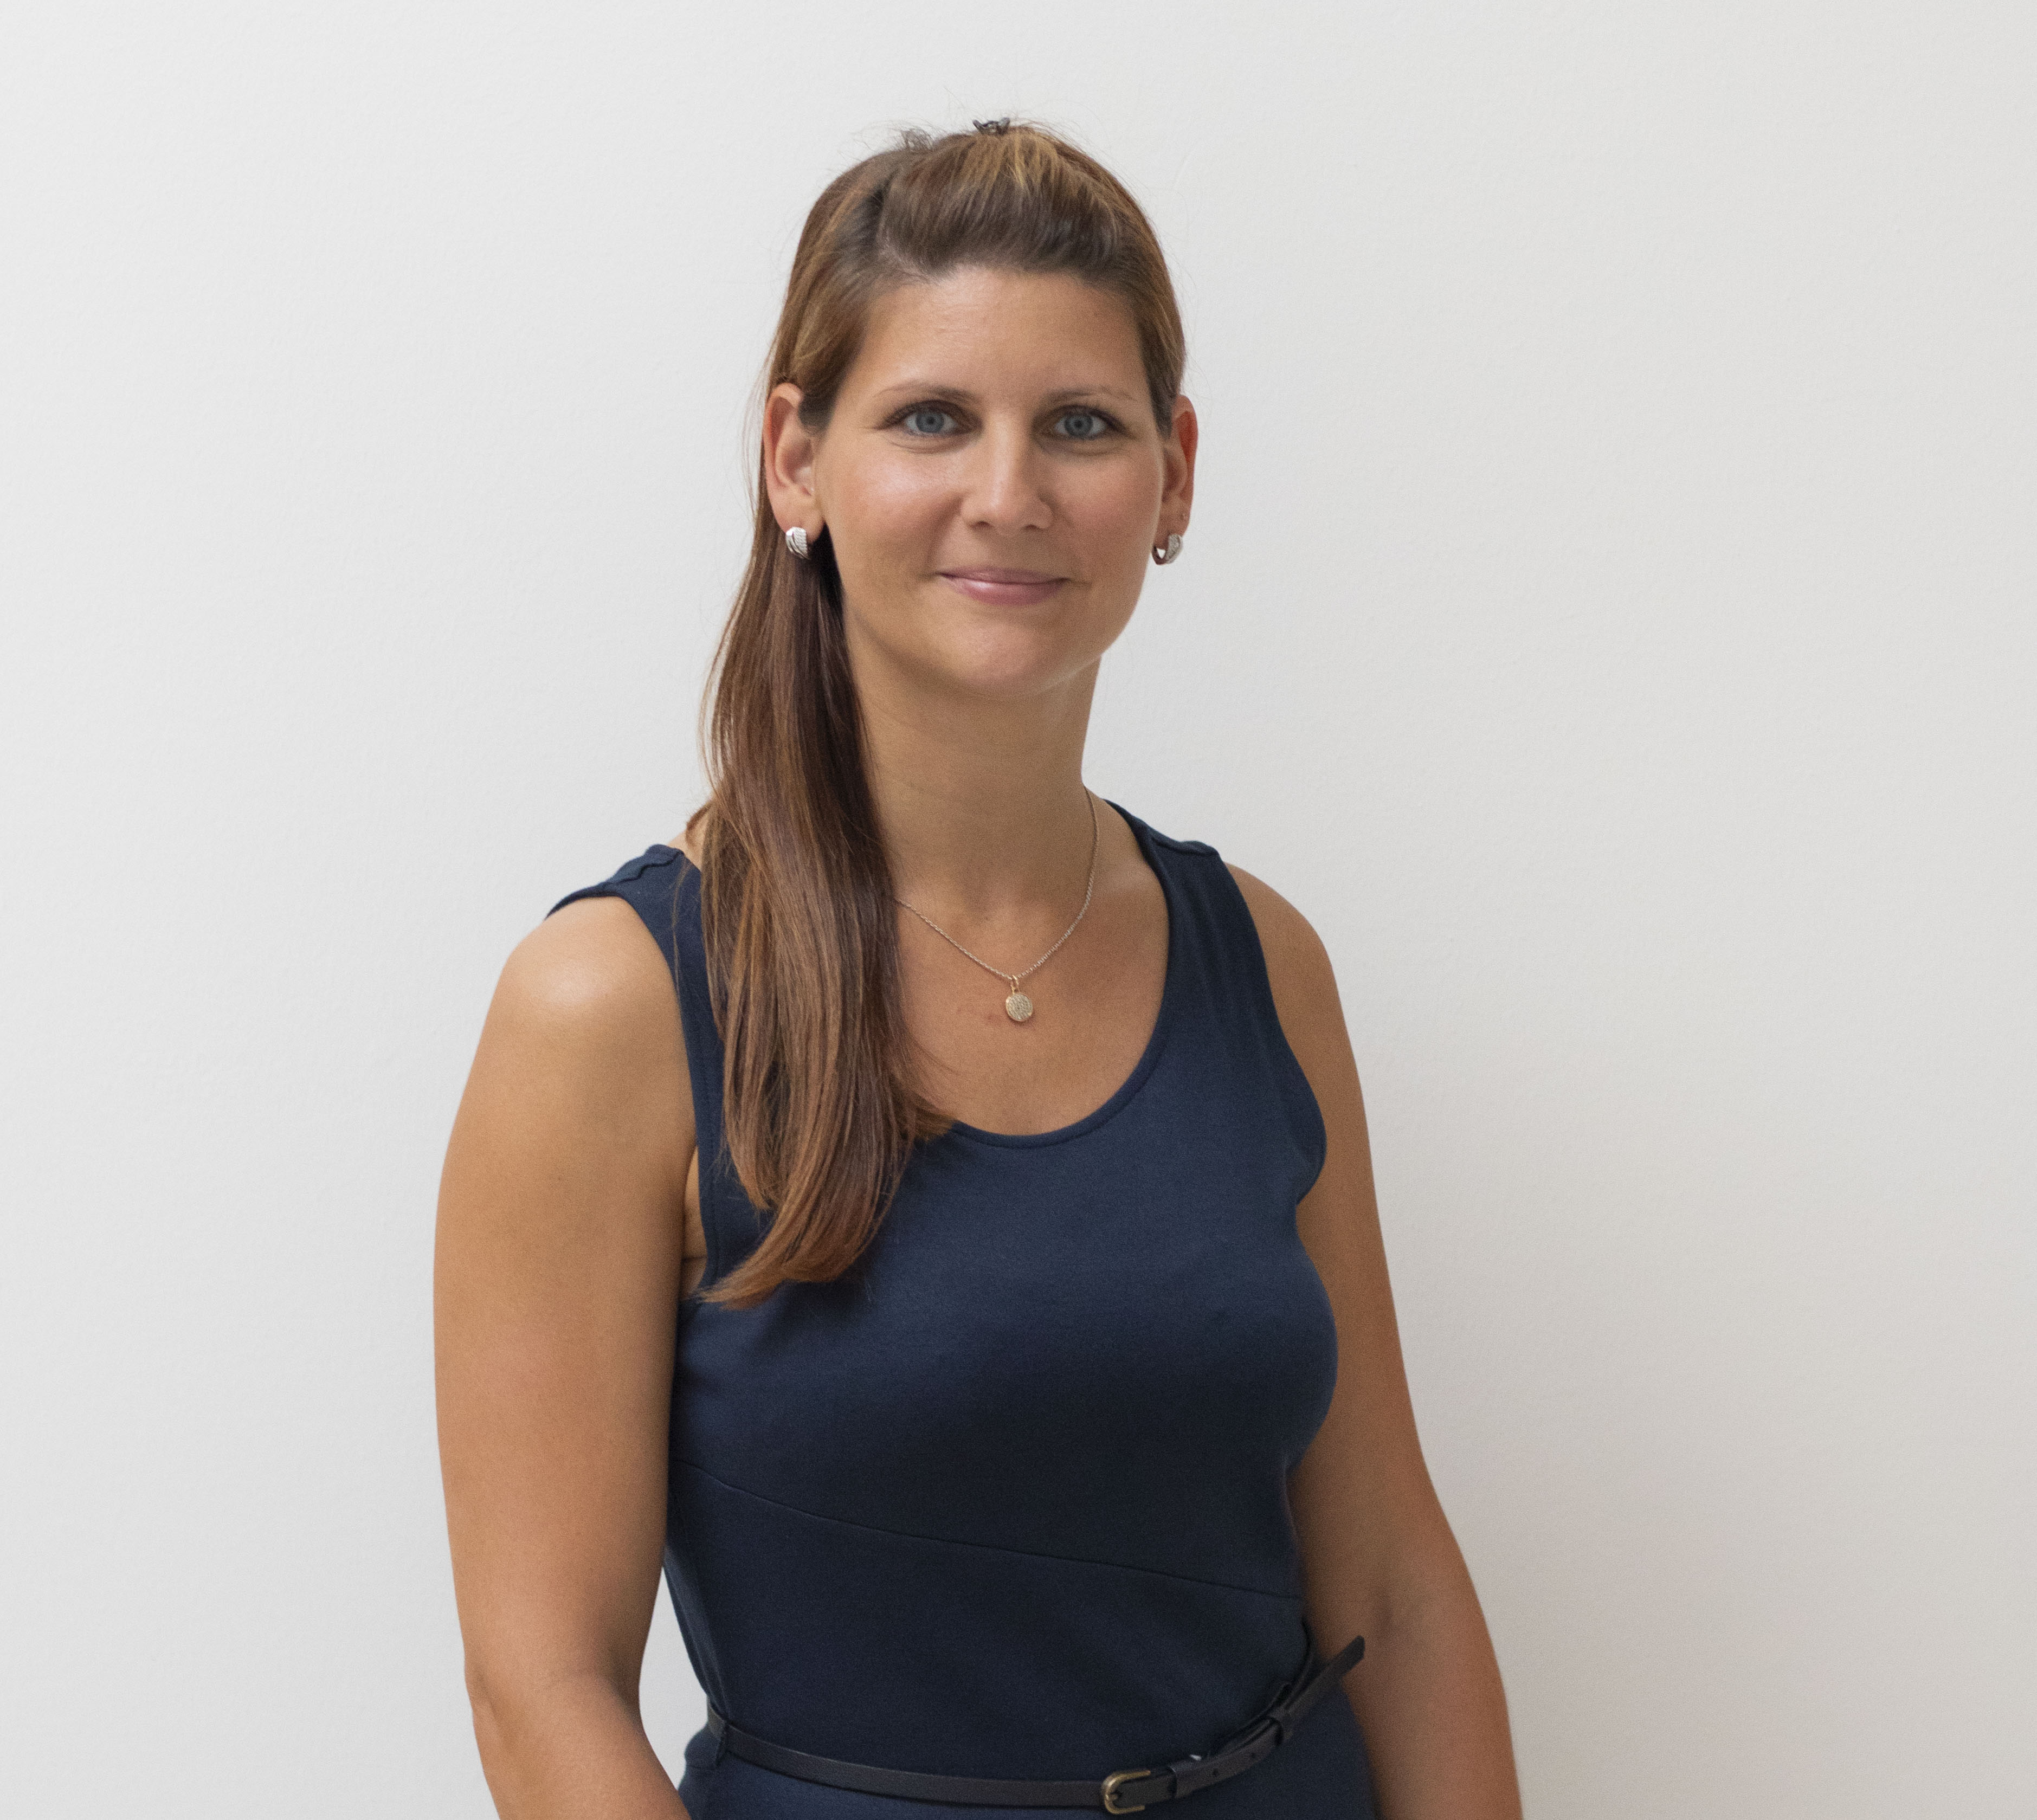 Lisa Thiede